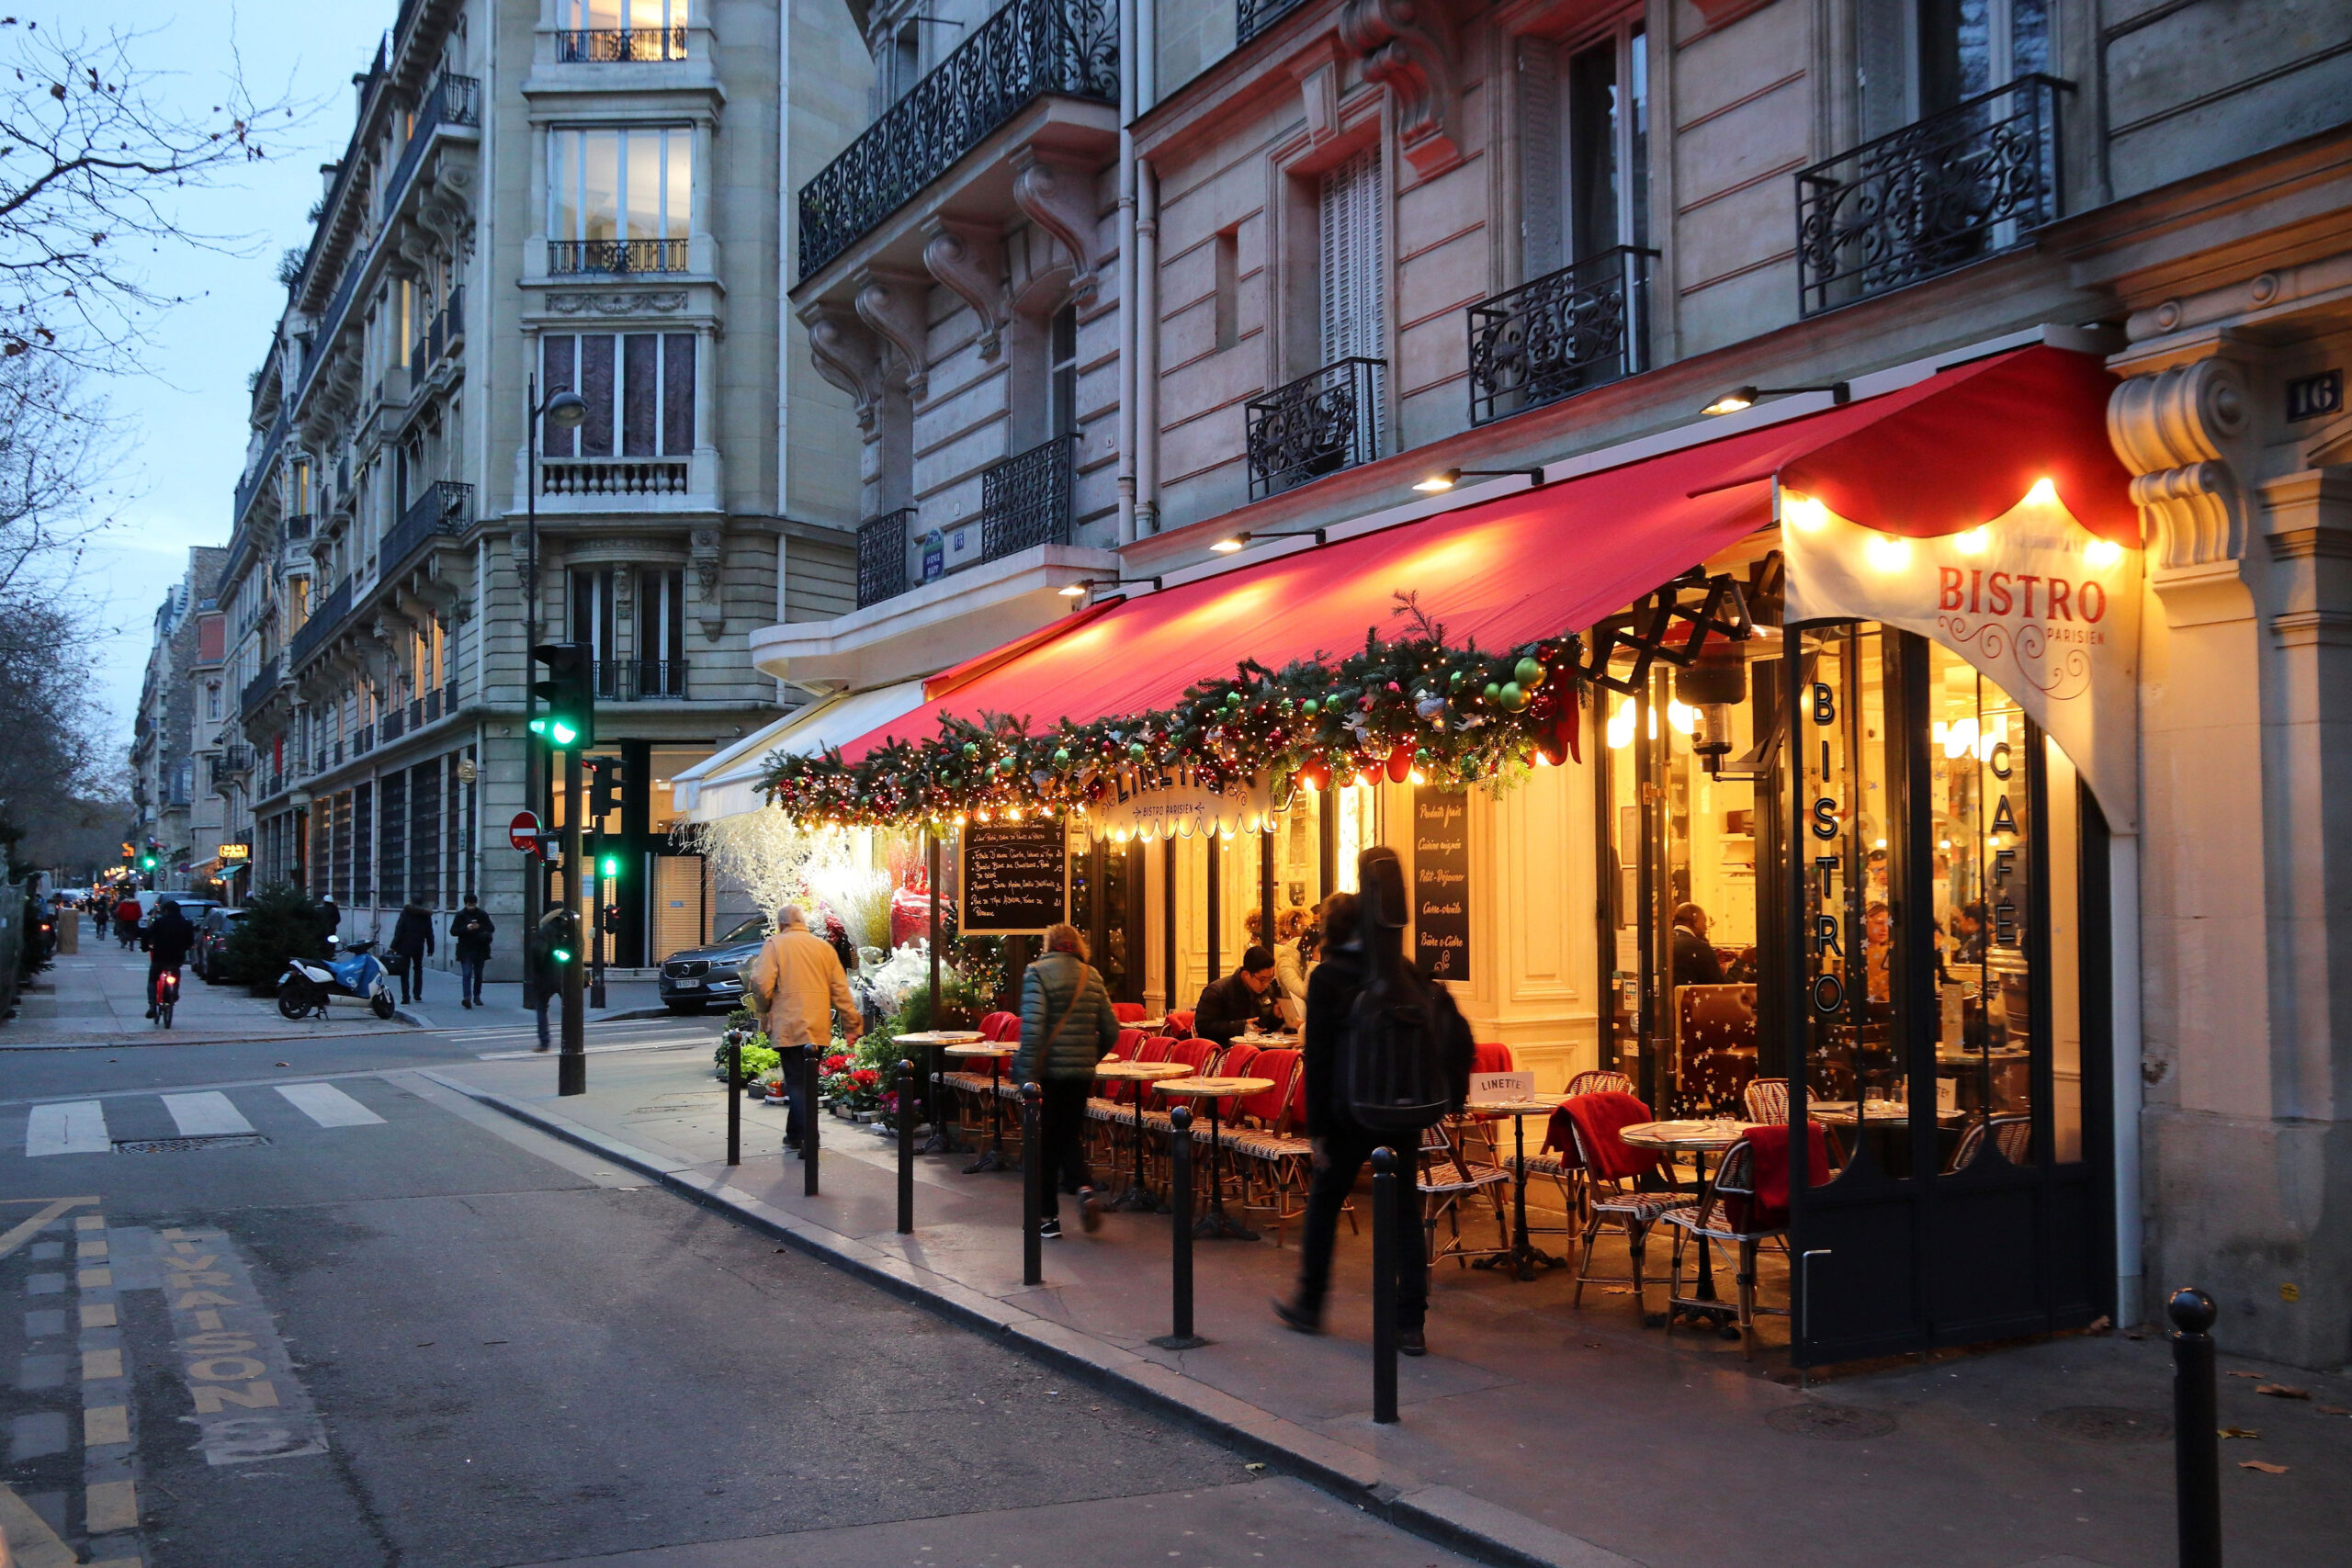 kleskode pakkeliste klaer Paris Frankrike